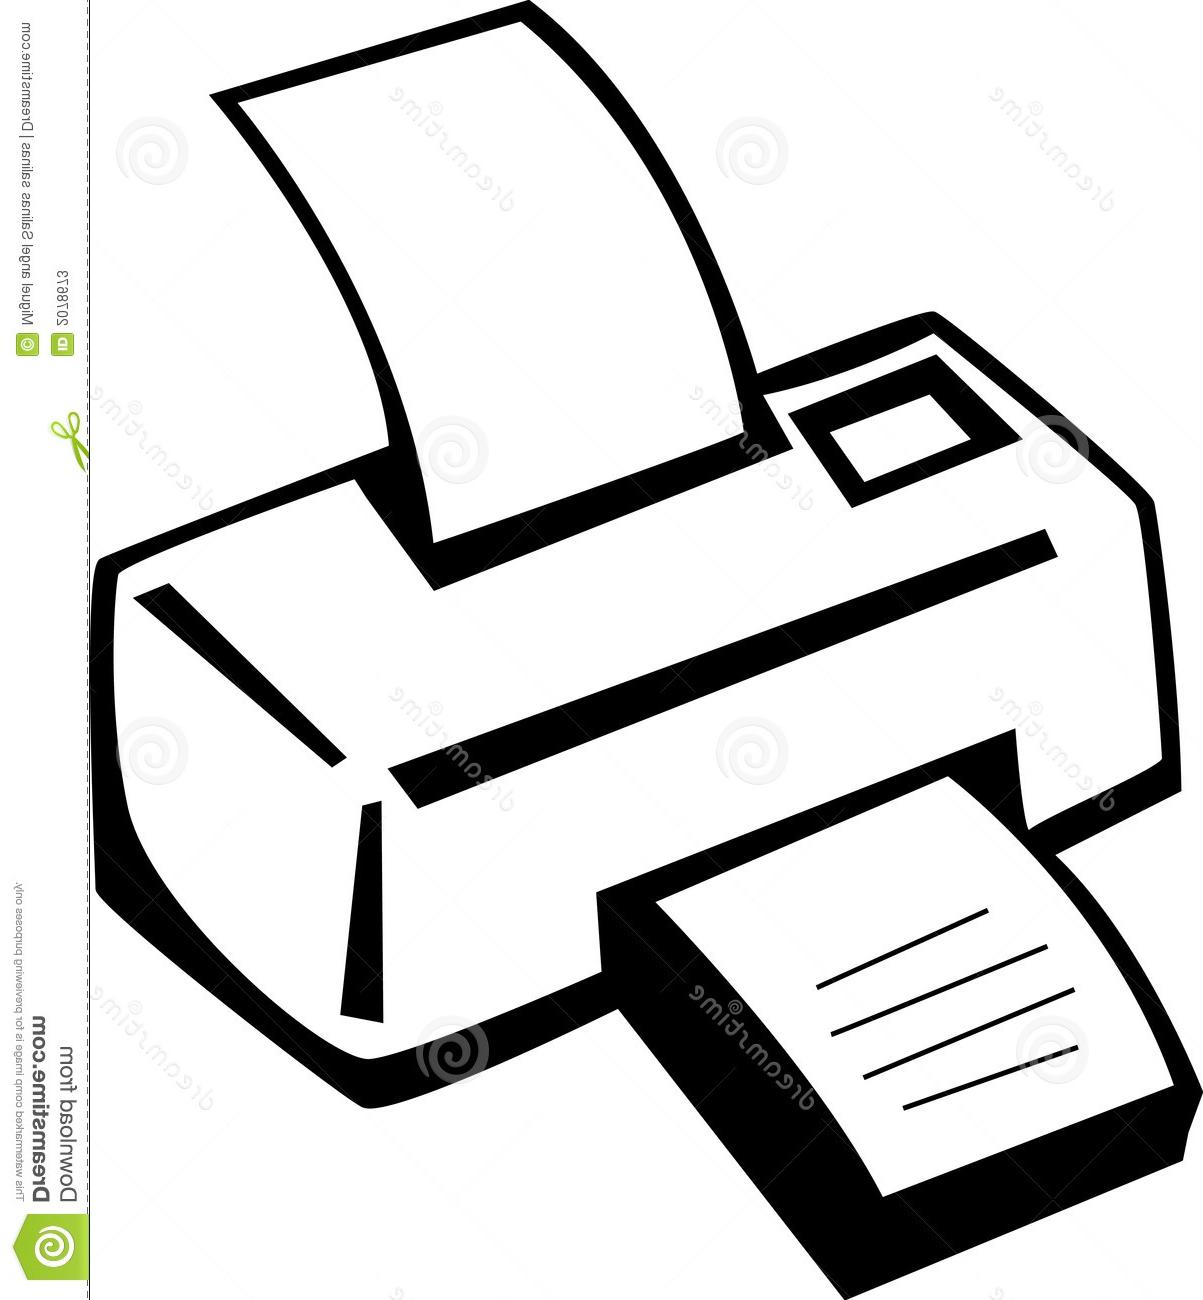 1203x1300 Hd Puter Printer Clipart Machine Vector Illustration File Free